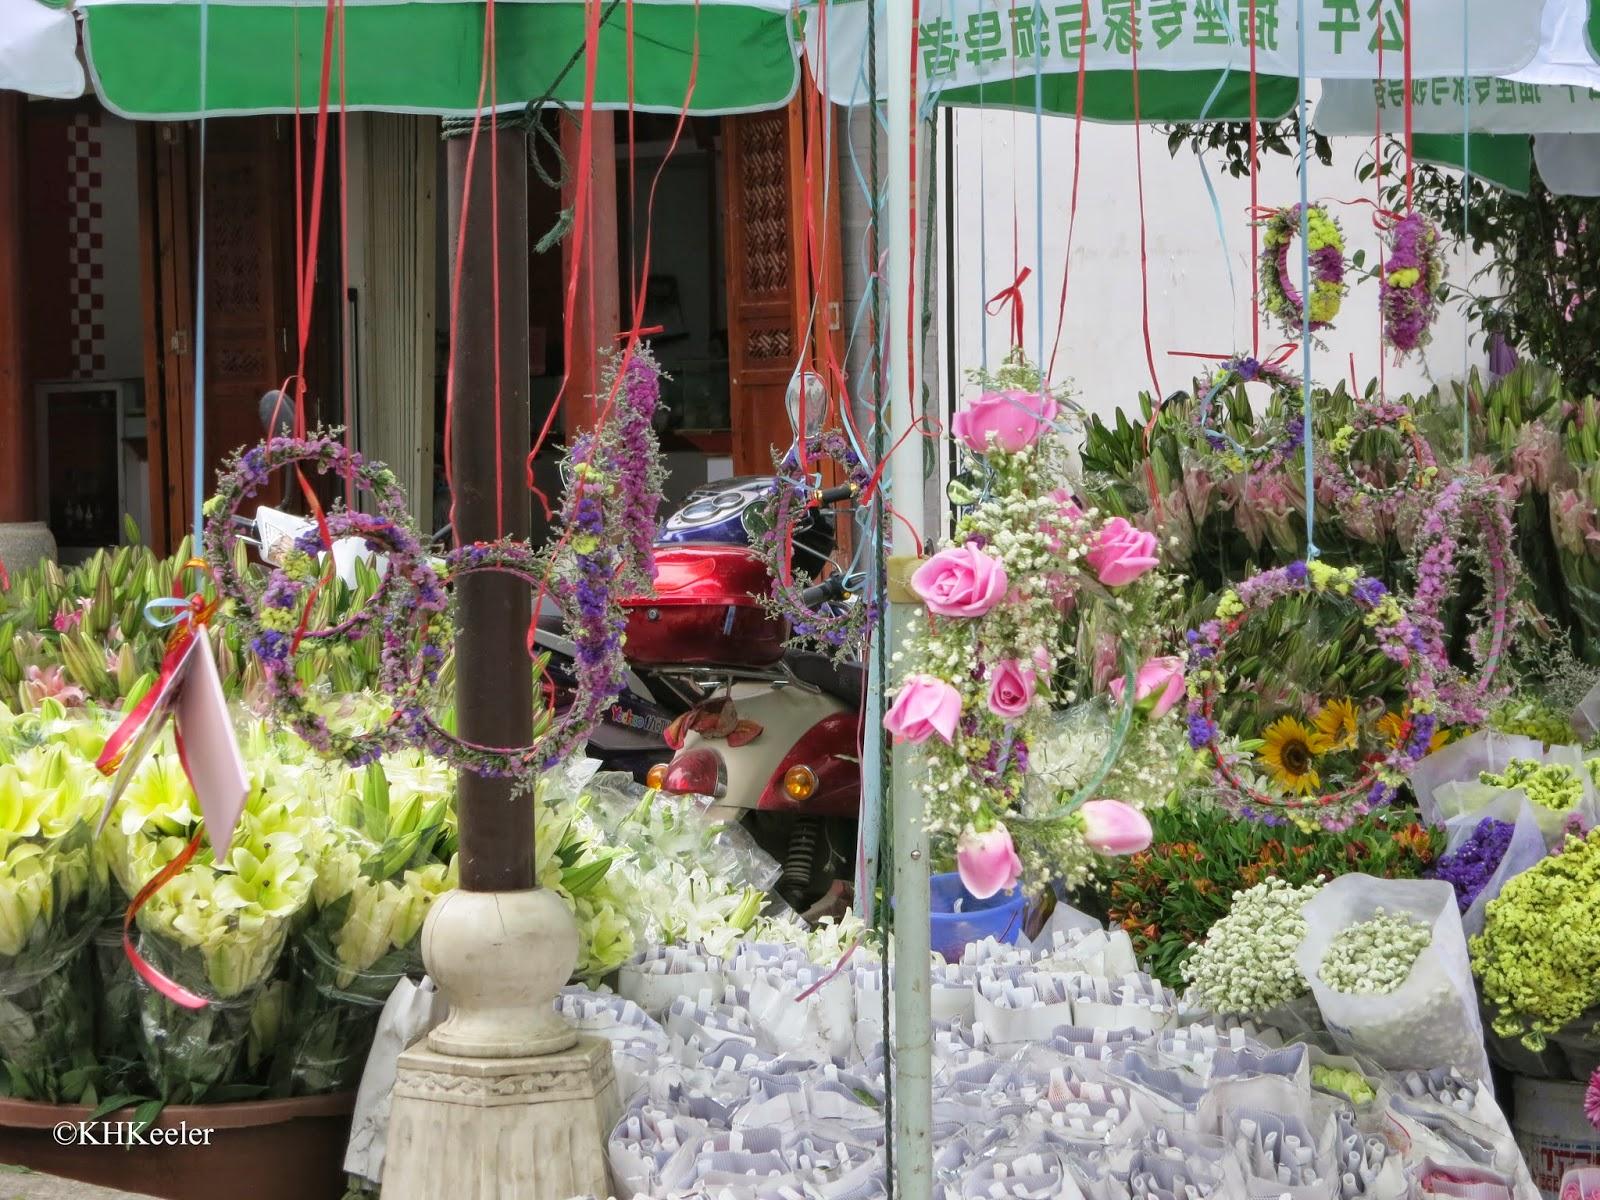 flower vendor, ancient city, Dali, China